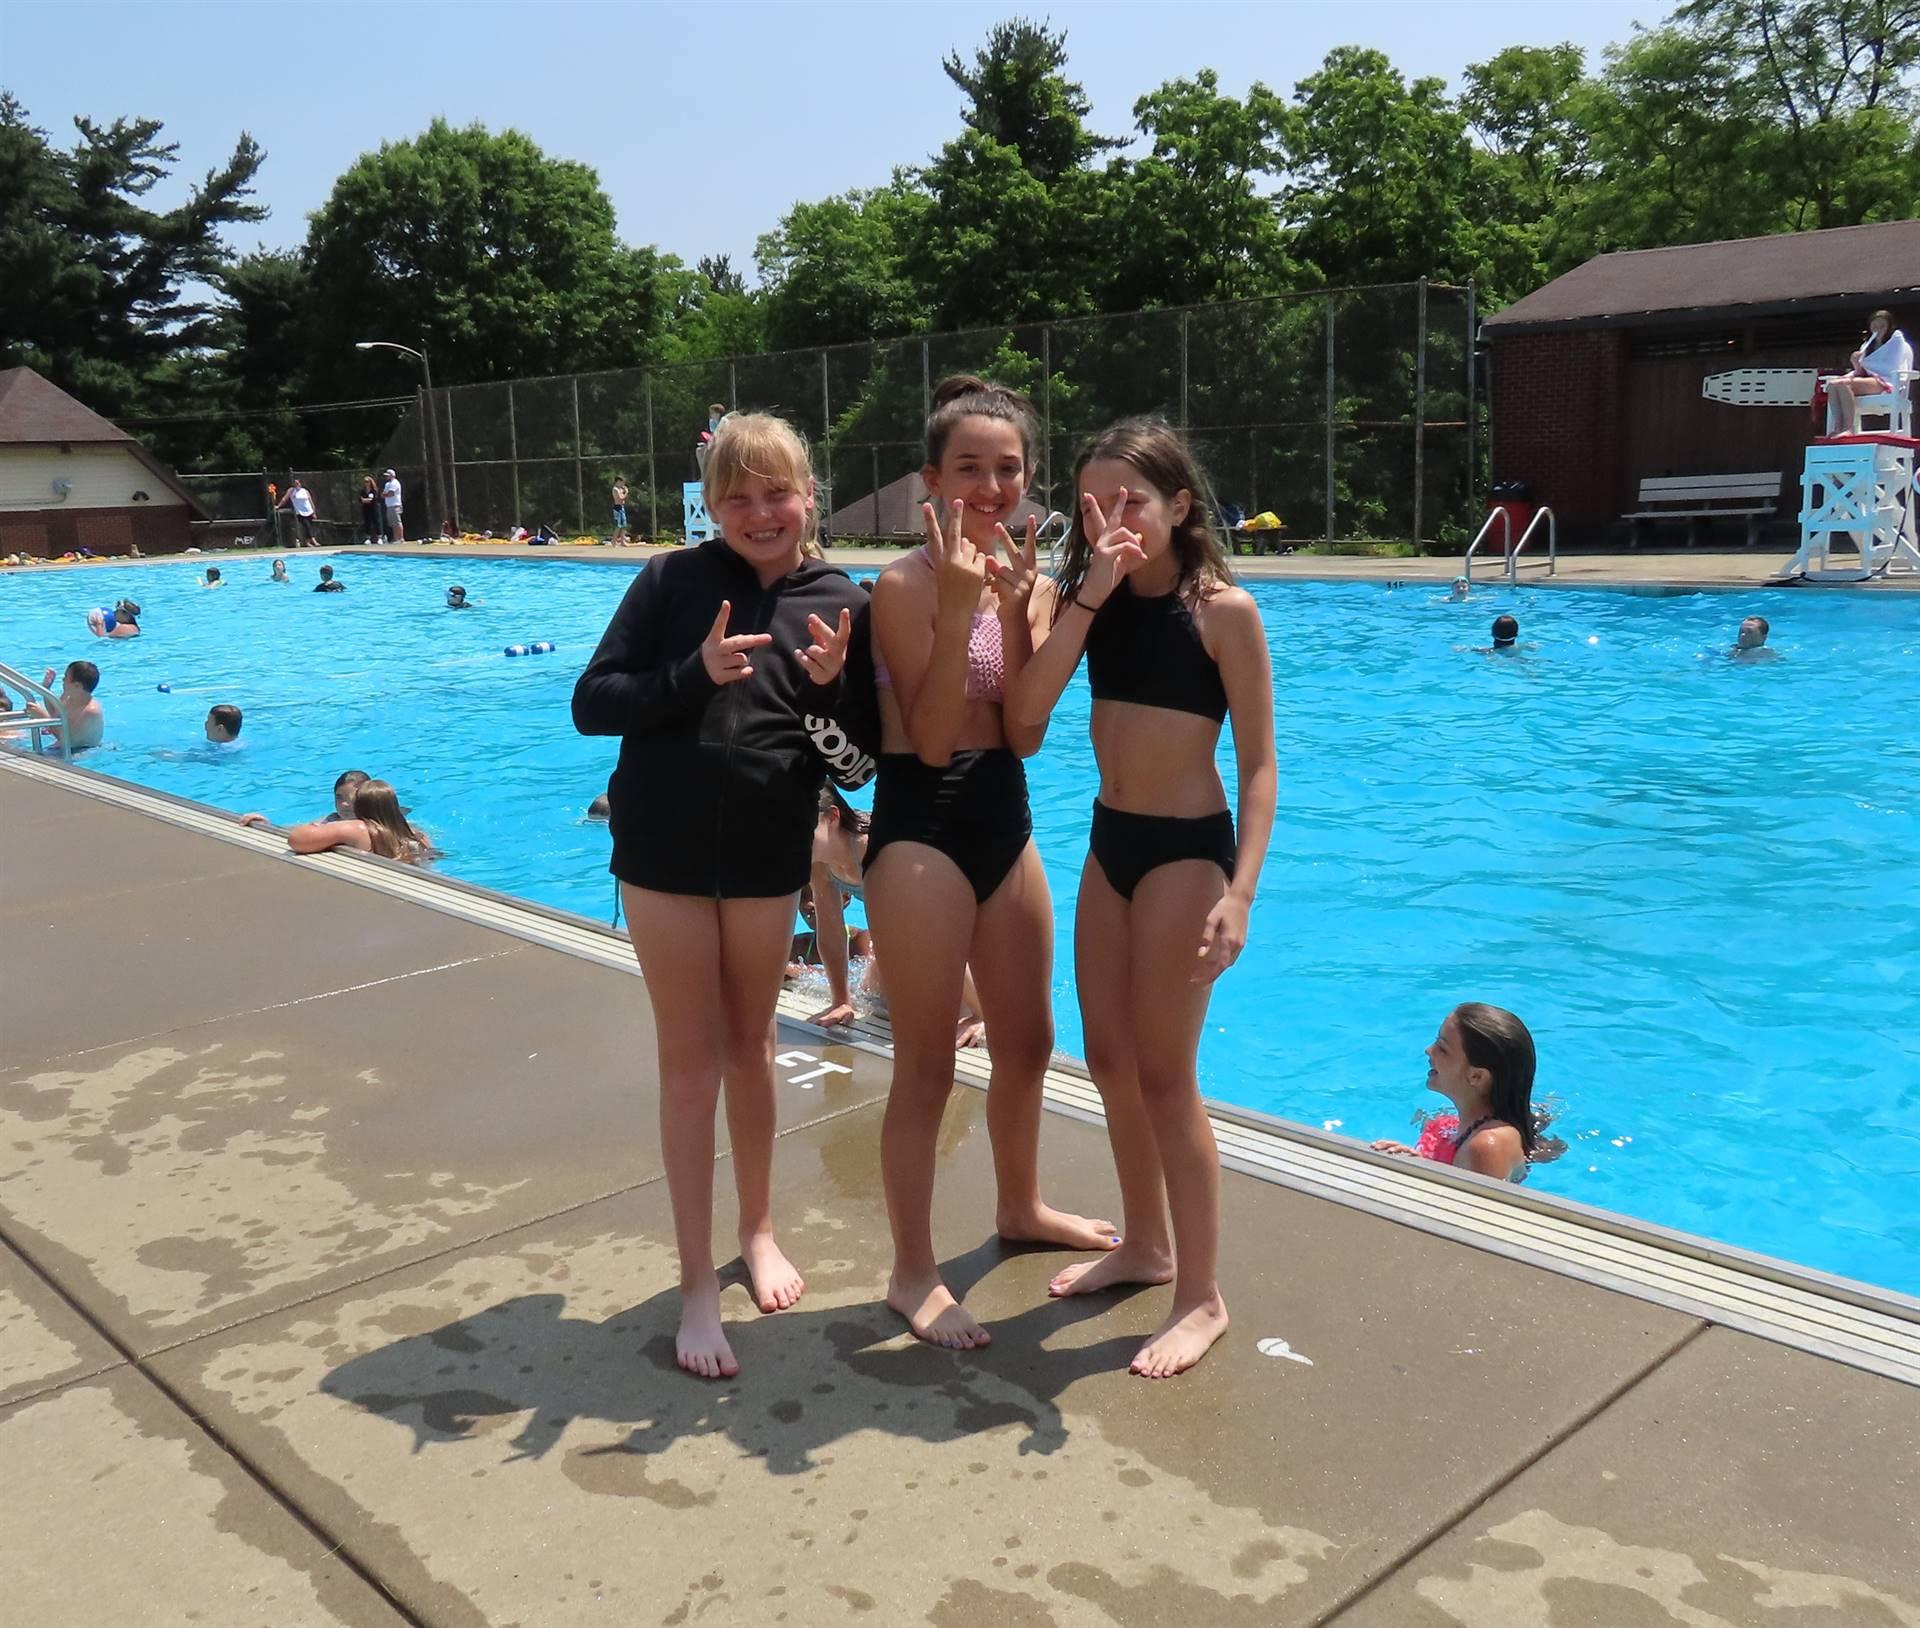 Girls posing poolside